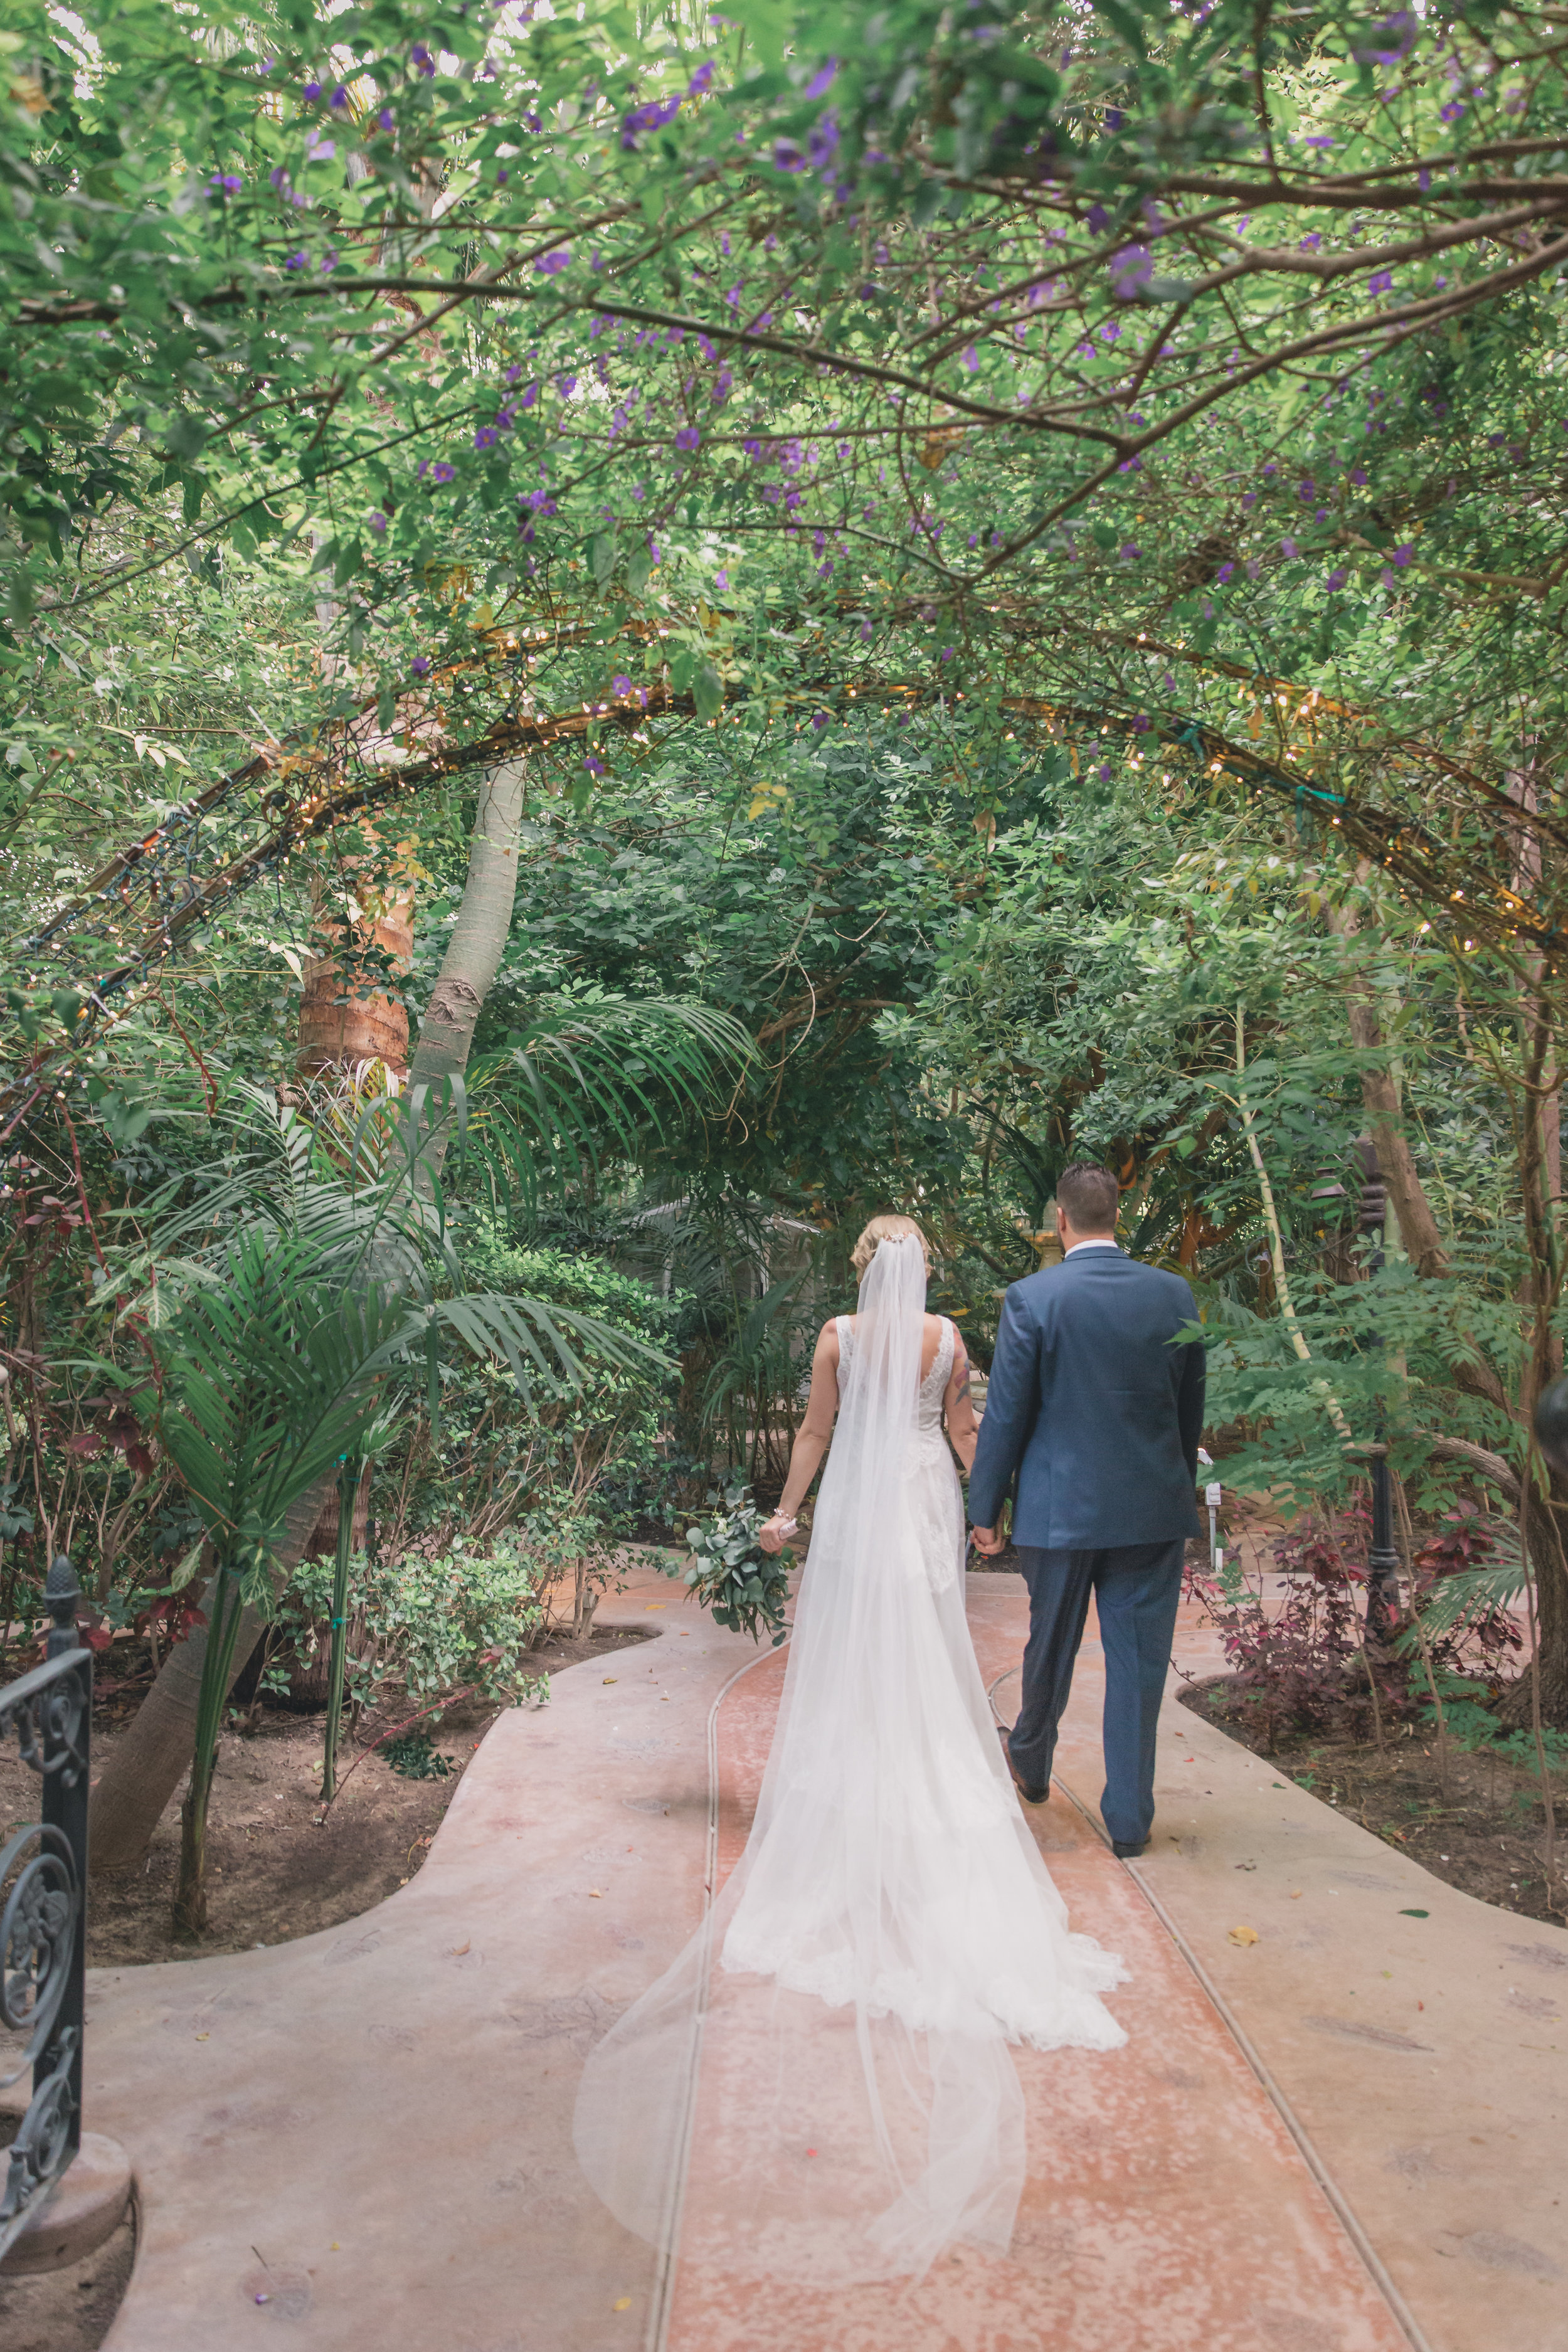 Wedding Photography - Edens Gardens, Moorpark California Wedding Venue - Bride and groom walking hand in hand through the gardens